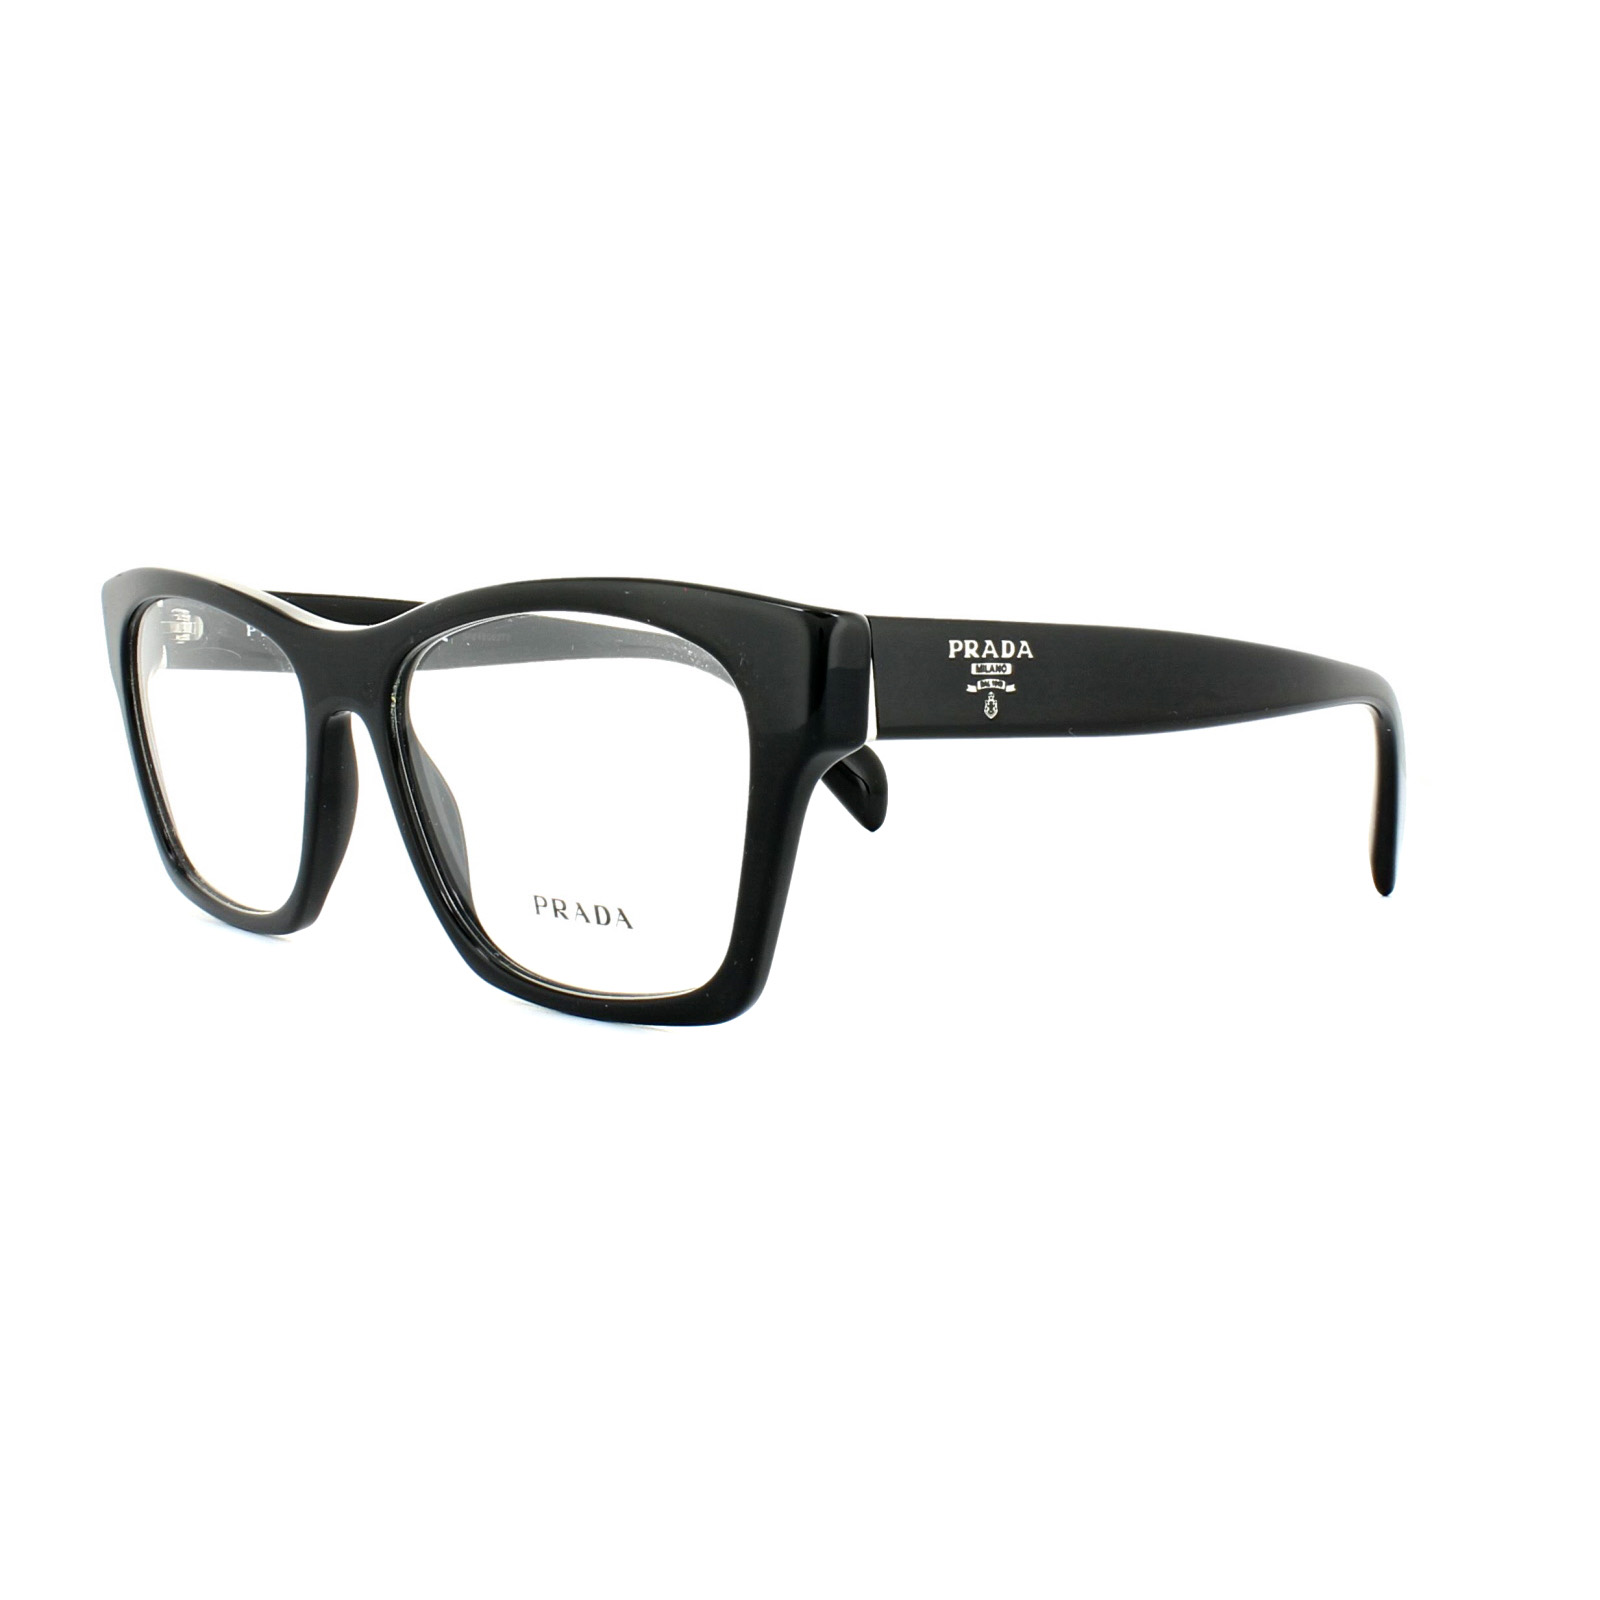 93d47ea135 Prada Glasses Frames PR 22SV 1AB1O1 Black Womens 54mm 8053672507041 ...